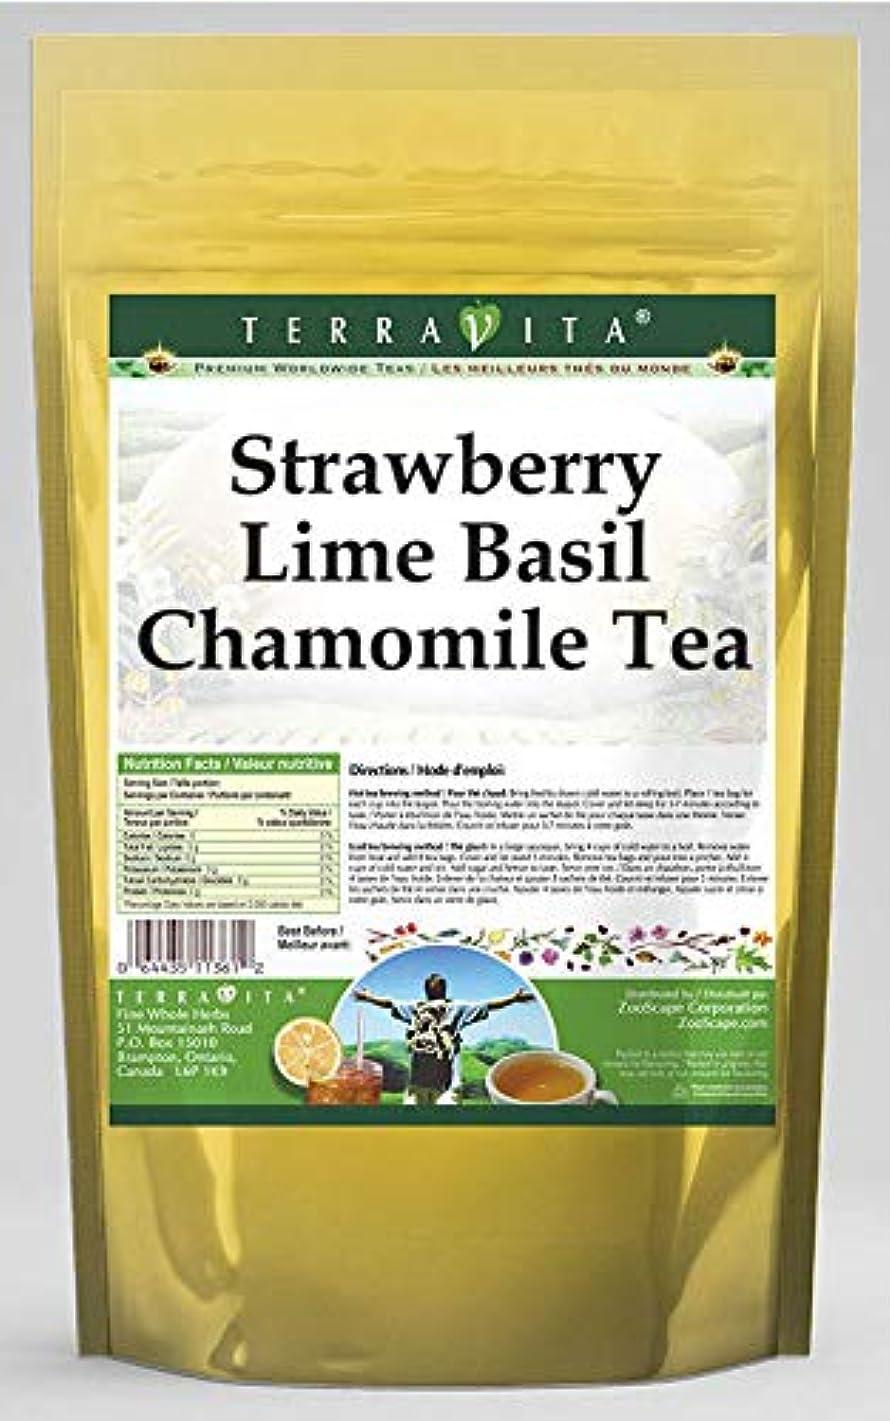 Strawberry Lime Basil Chamomile Tea (25 Tea Bags, ZIN: 542113) - 3 Pack